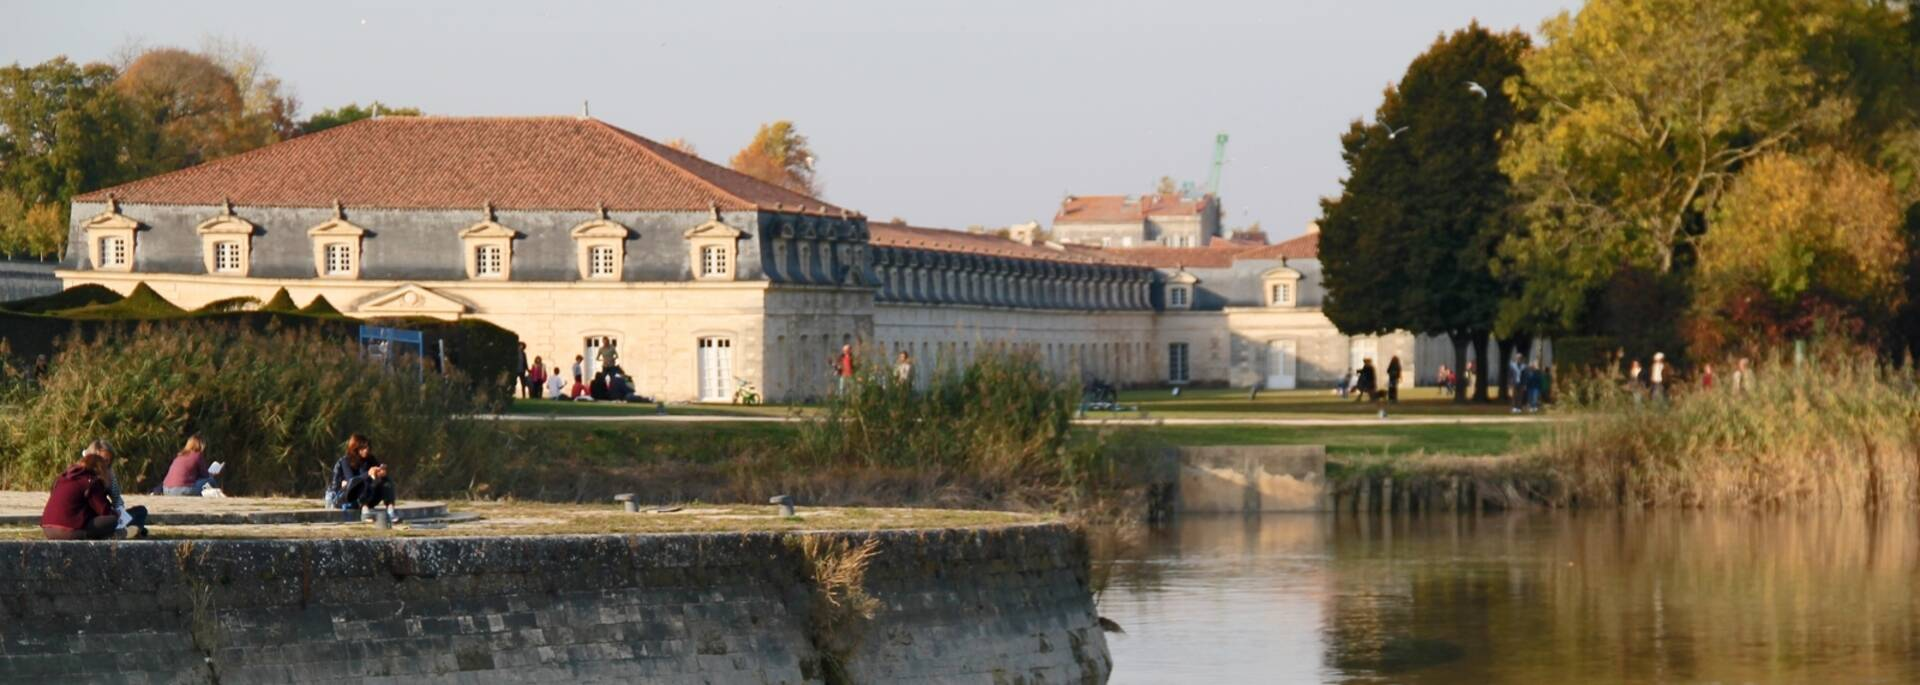 The Corderie Royale in Rochefort - © Office de tourisme Rochefort Océan